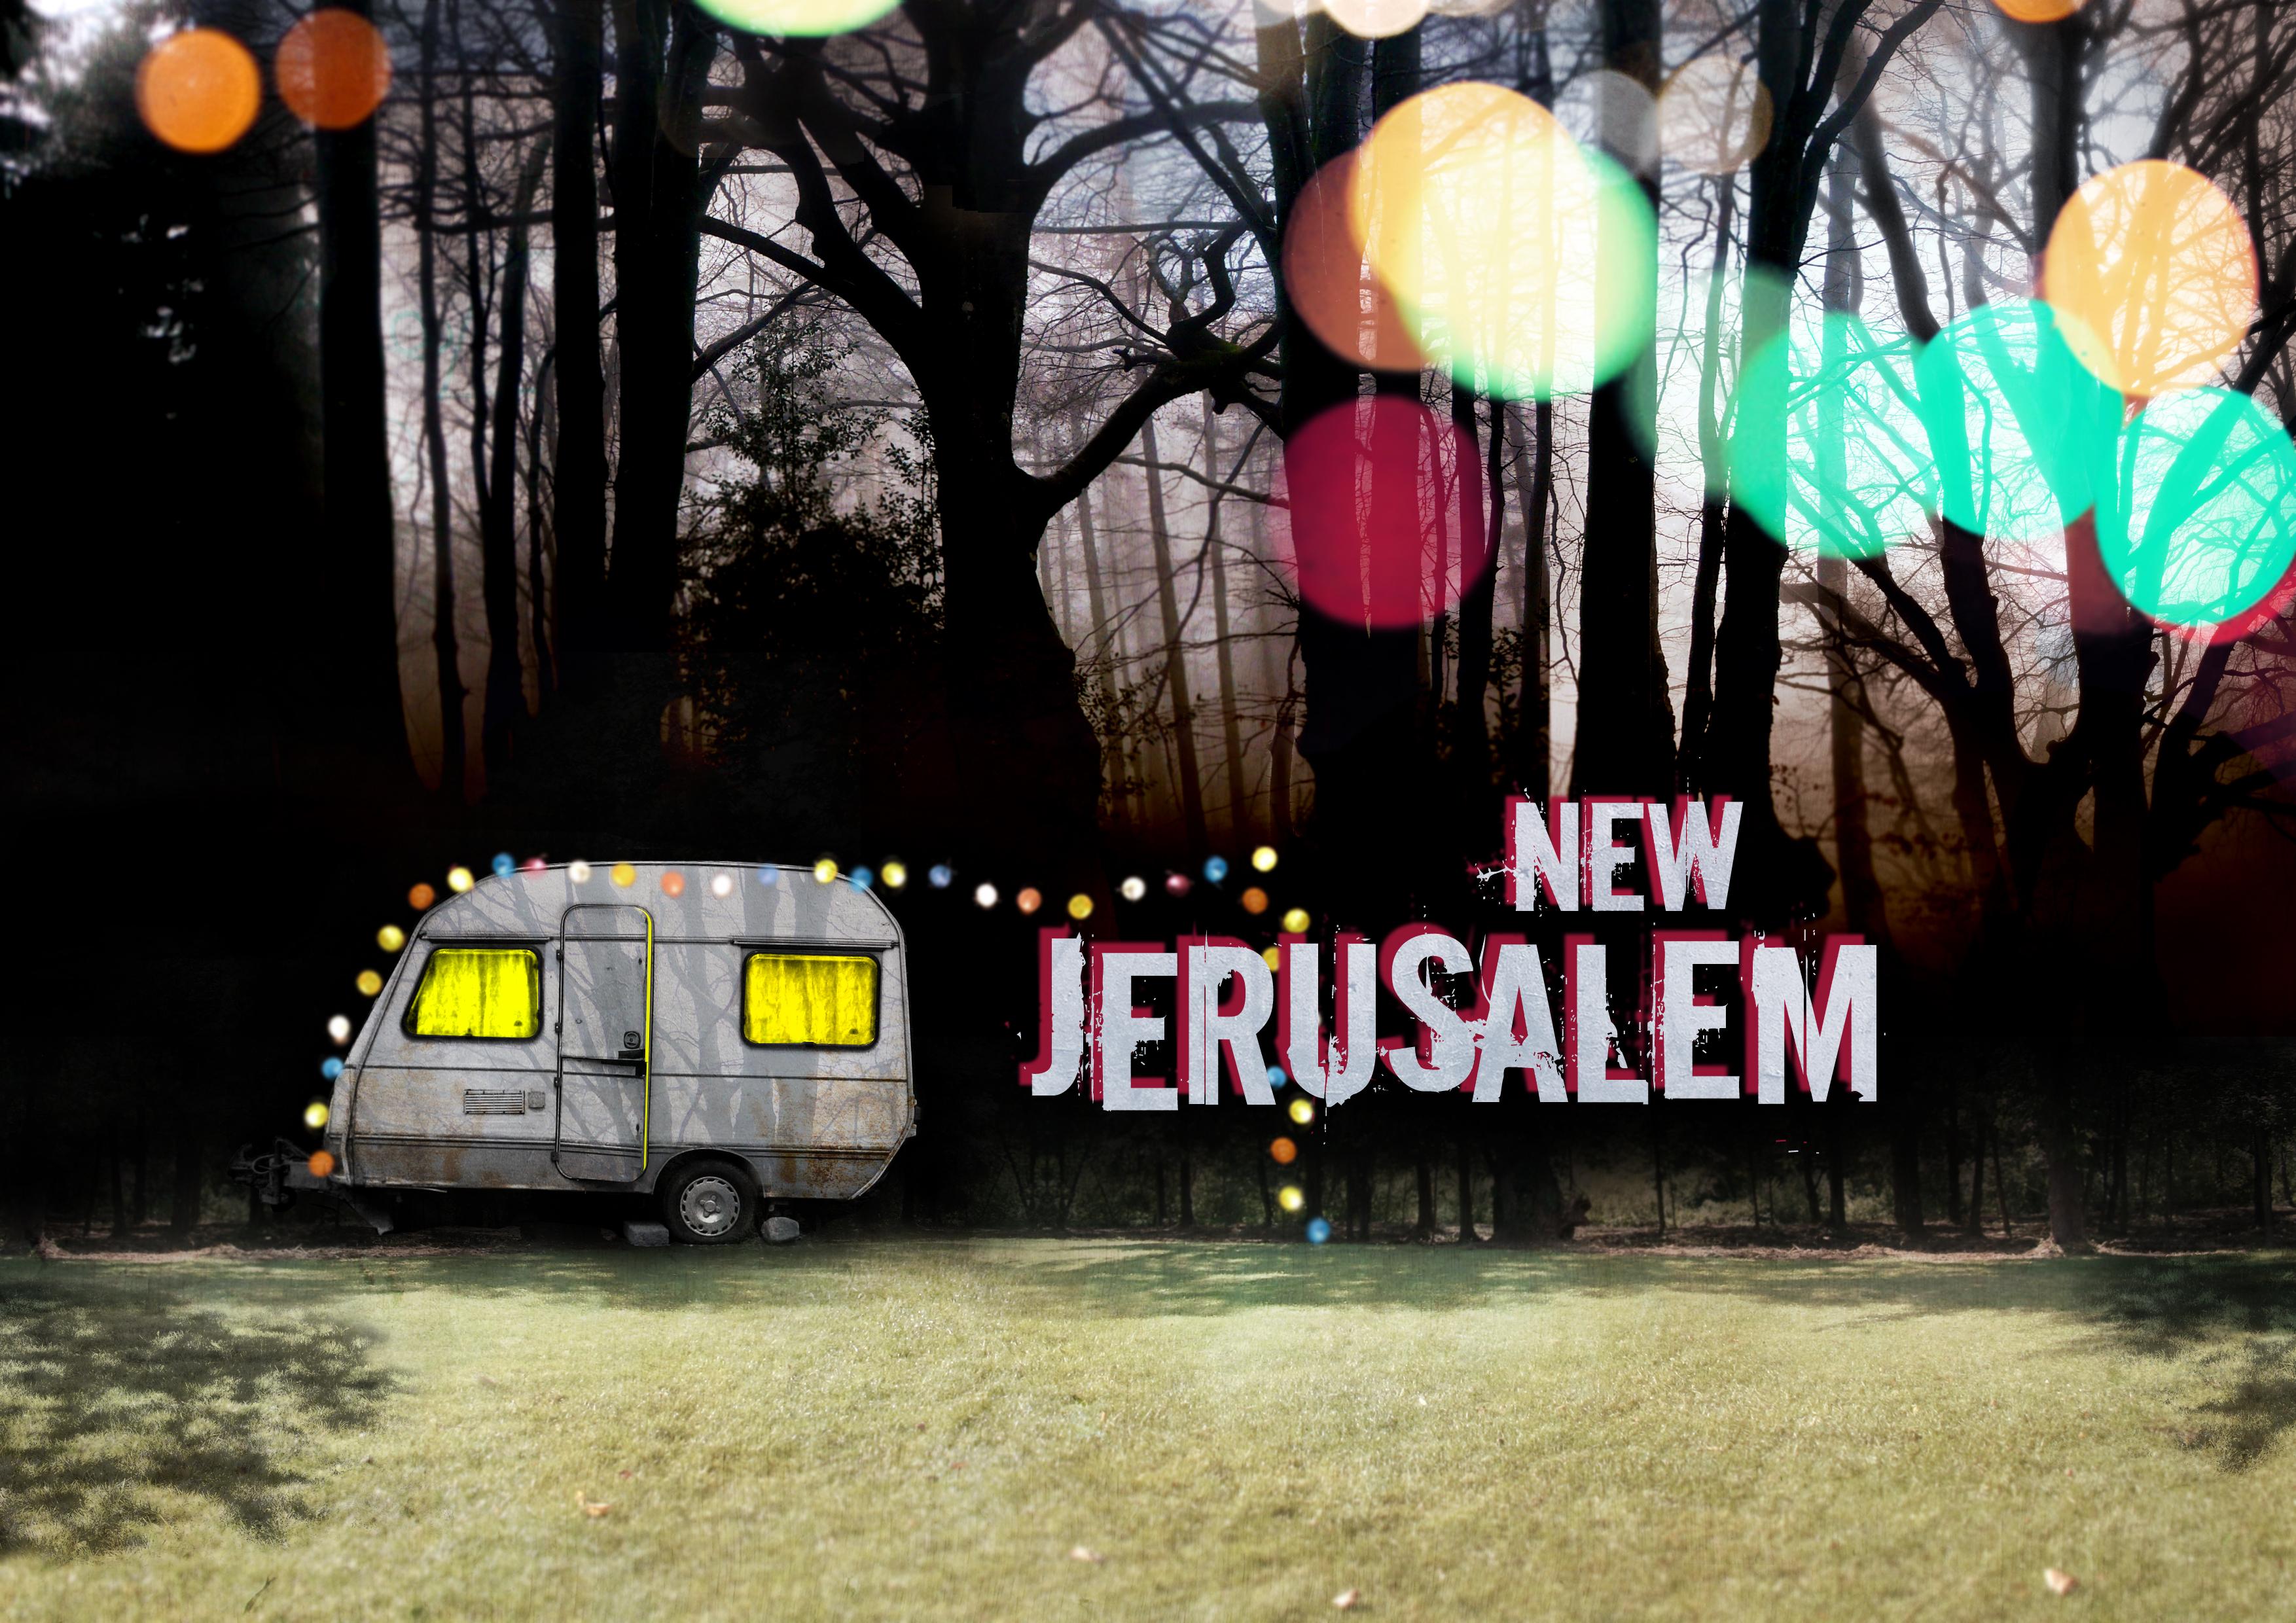 newjerusalem1.jpg